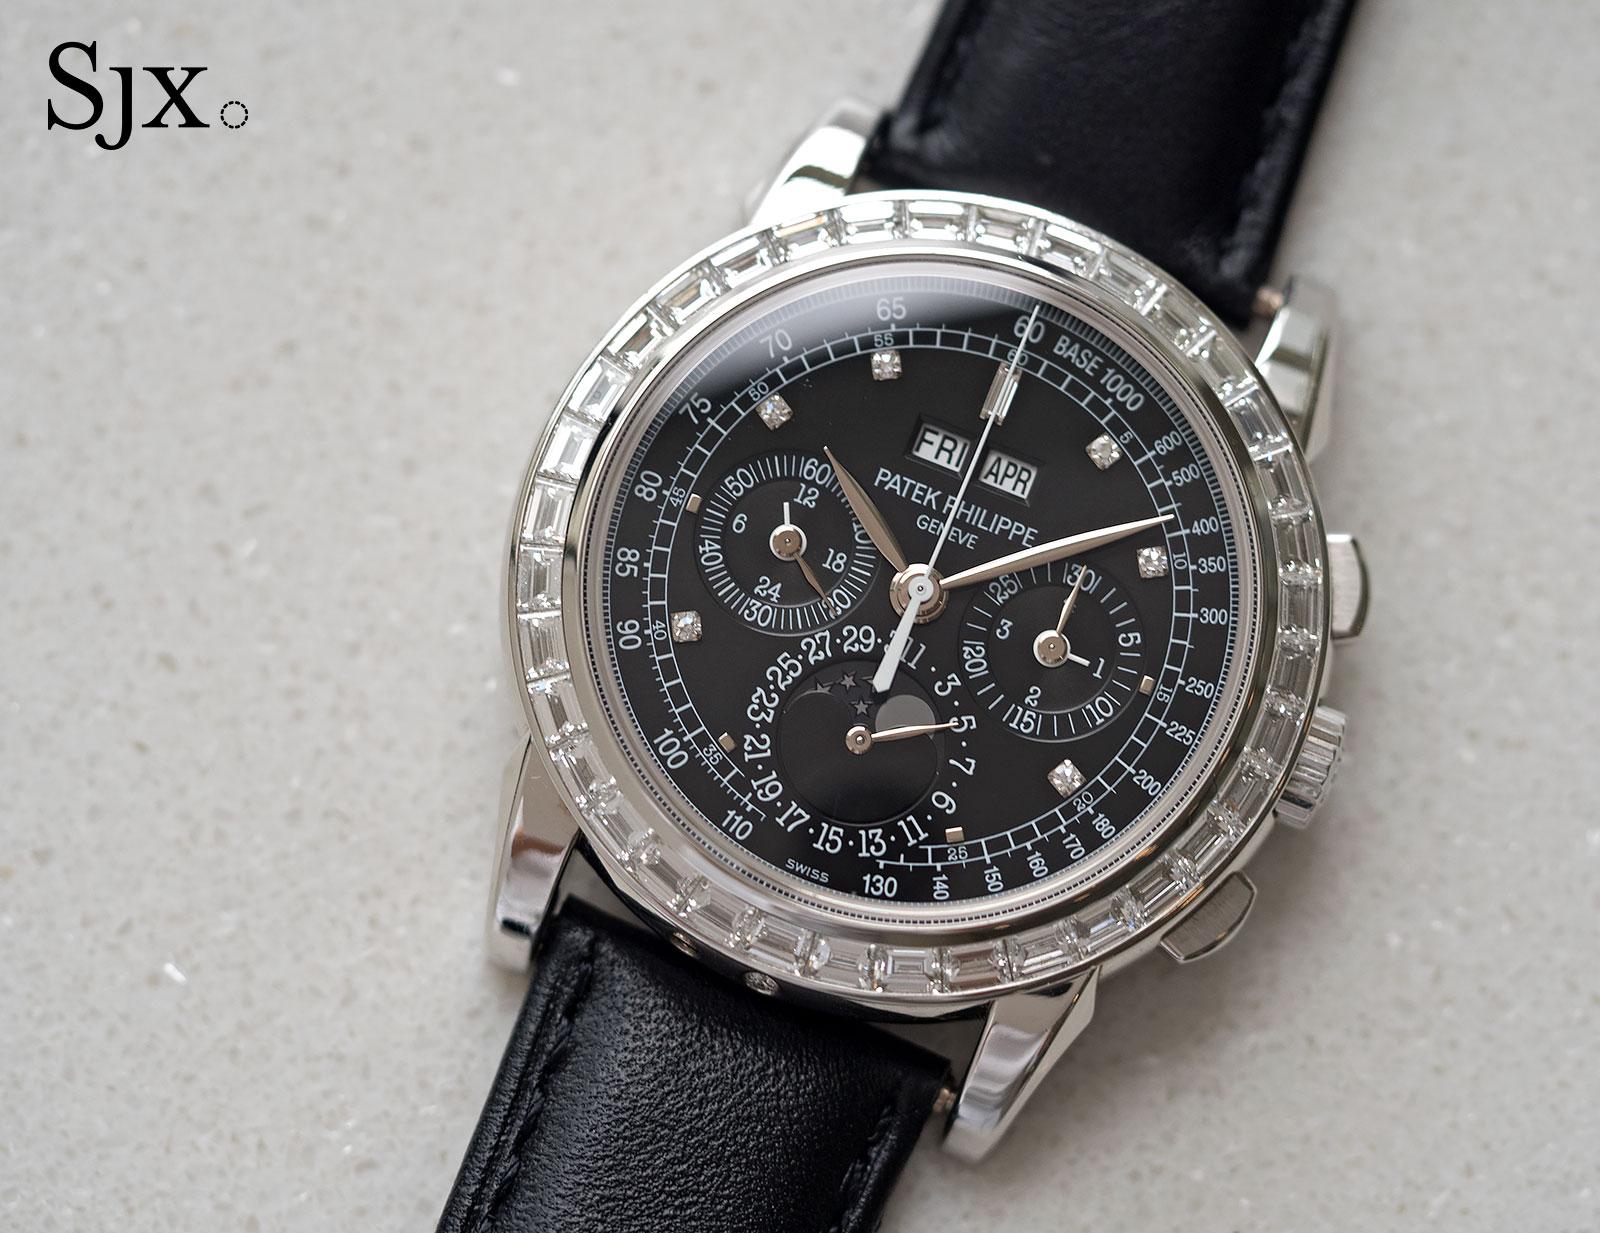 Patek Philippe 5971P diamonds 2